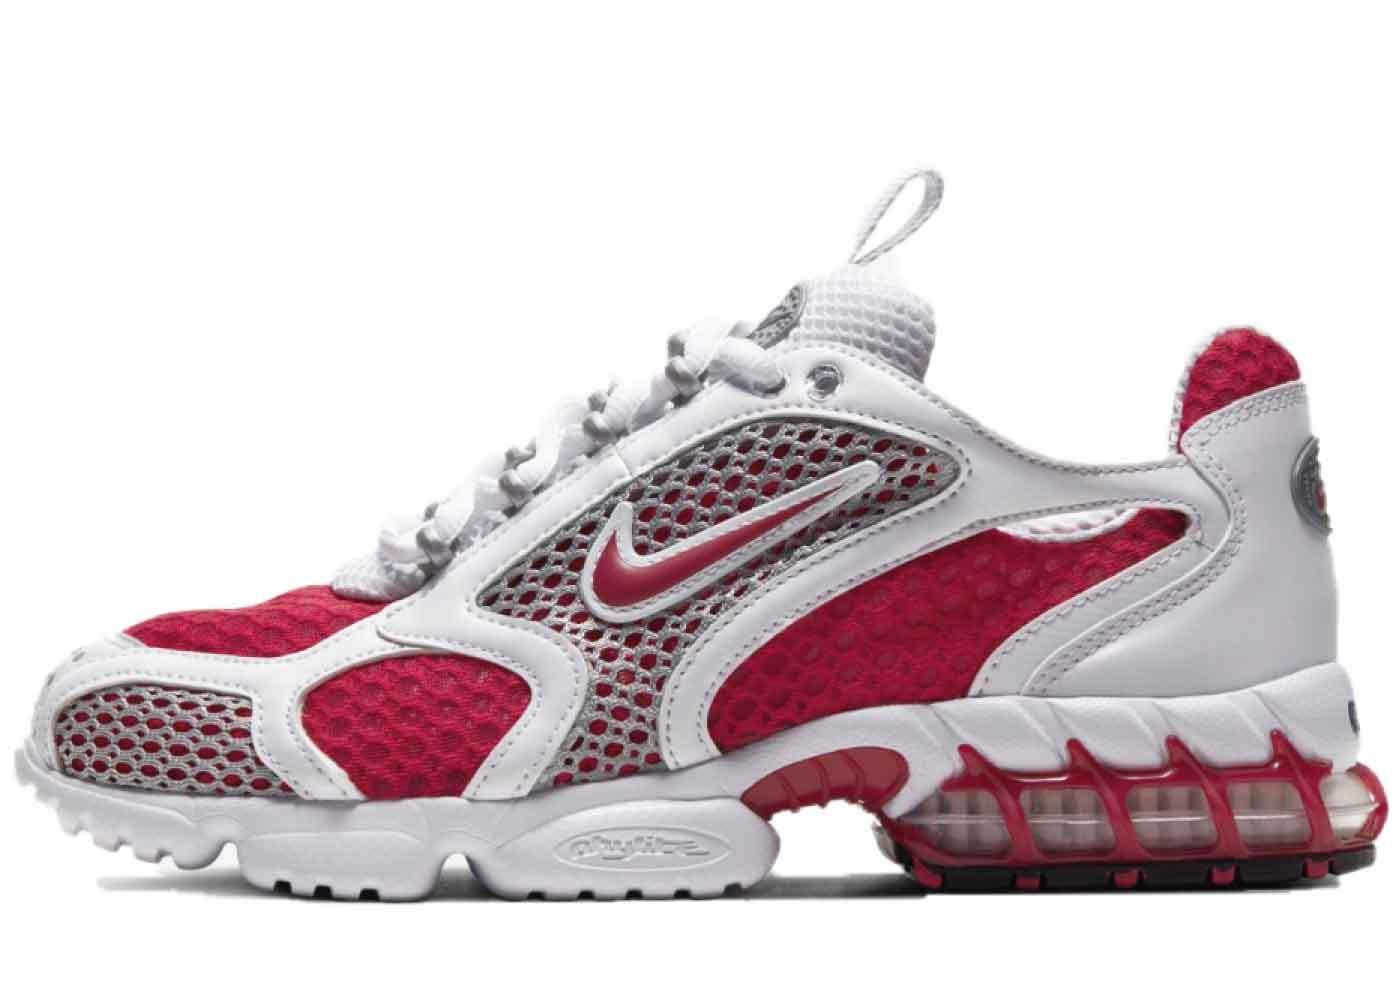 Nike Air Zoom Spiridon Cage 2 Cardinal Red Womensの写真